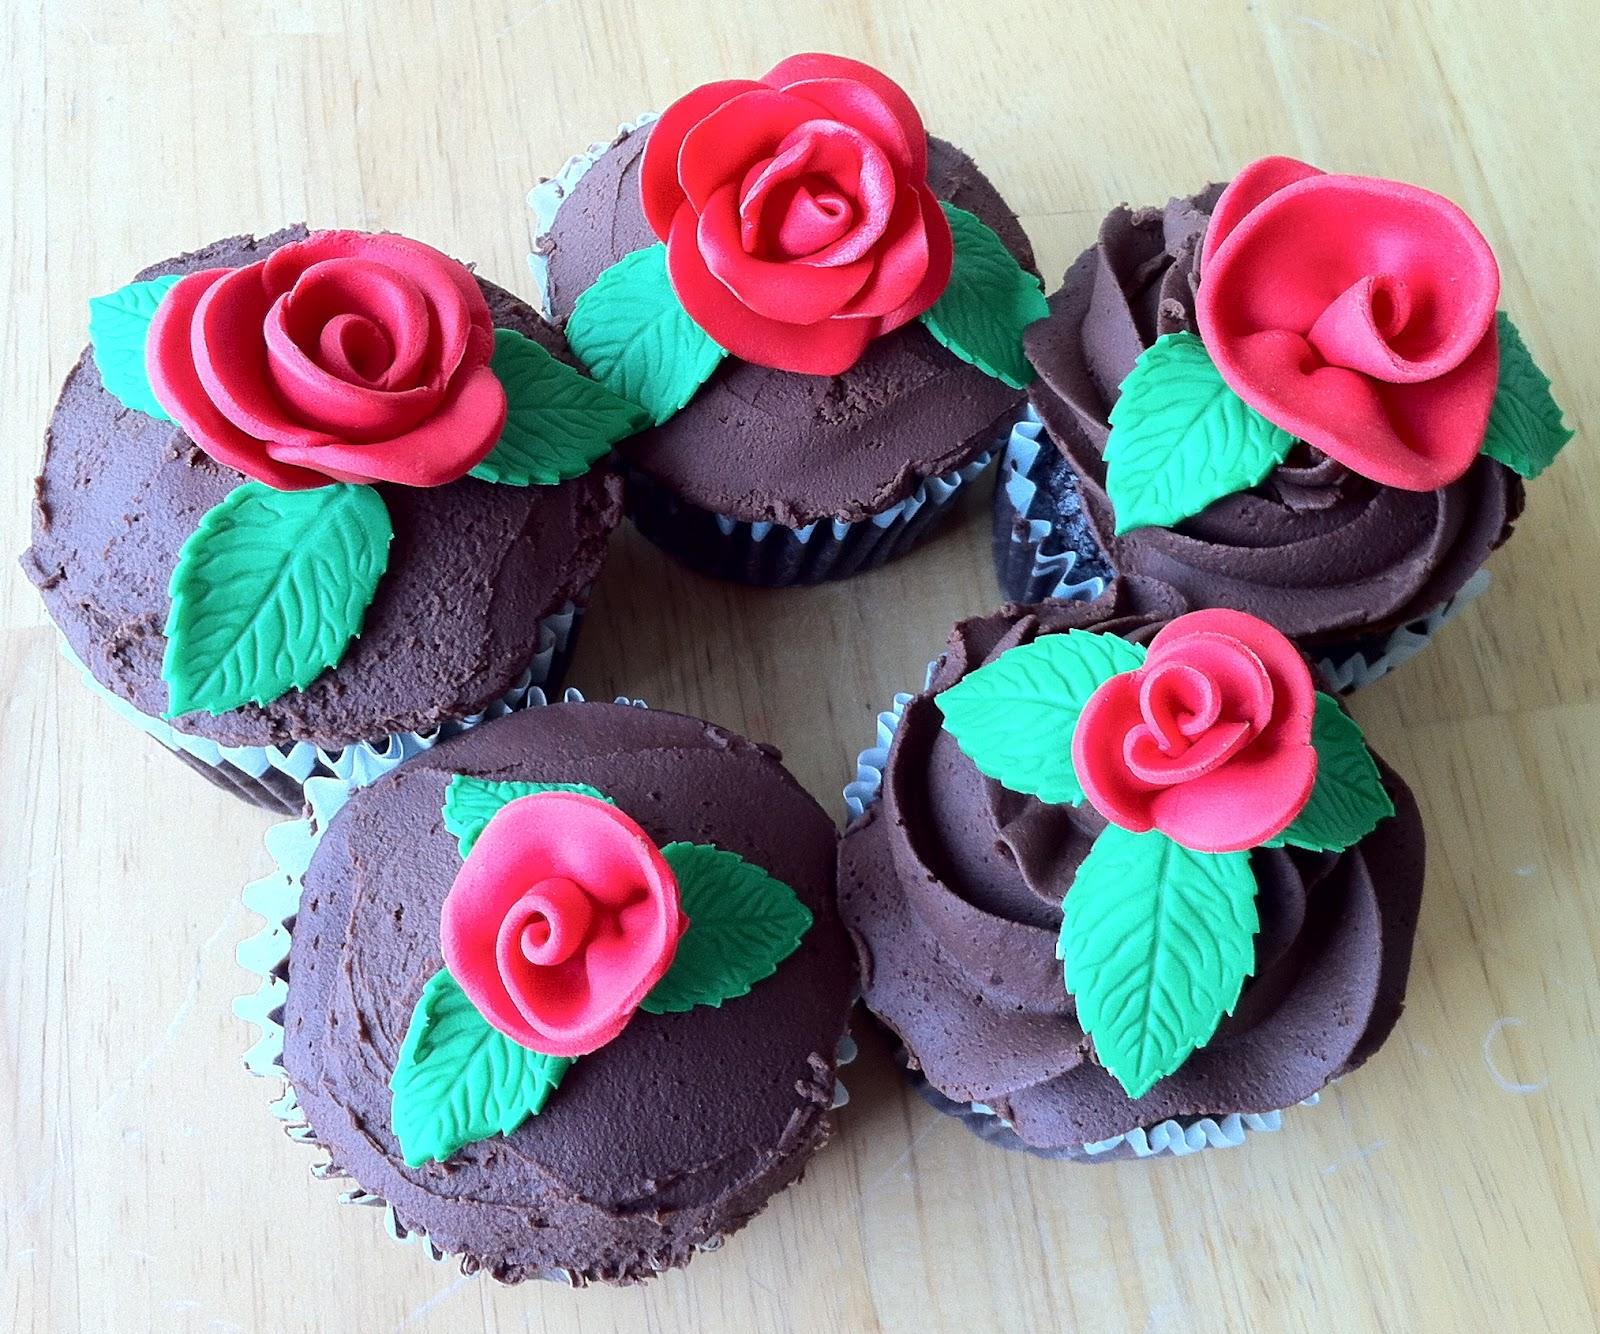 Betty Crocker Decorating Cake Icing Gluten Free : Betty Crocker Gluten Free Cake Mix and Easy Cupcake ...